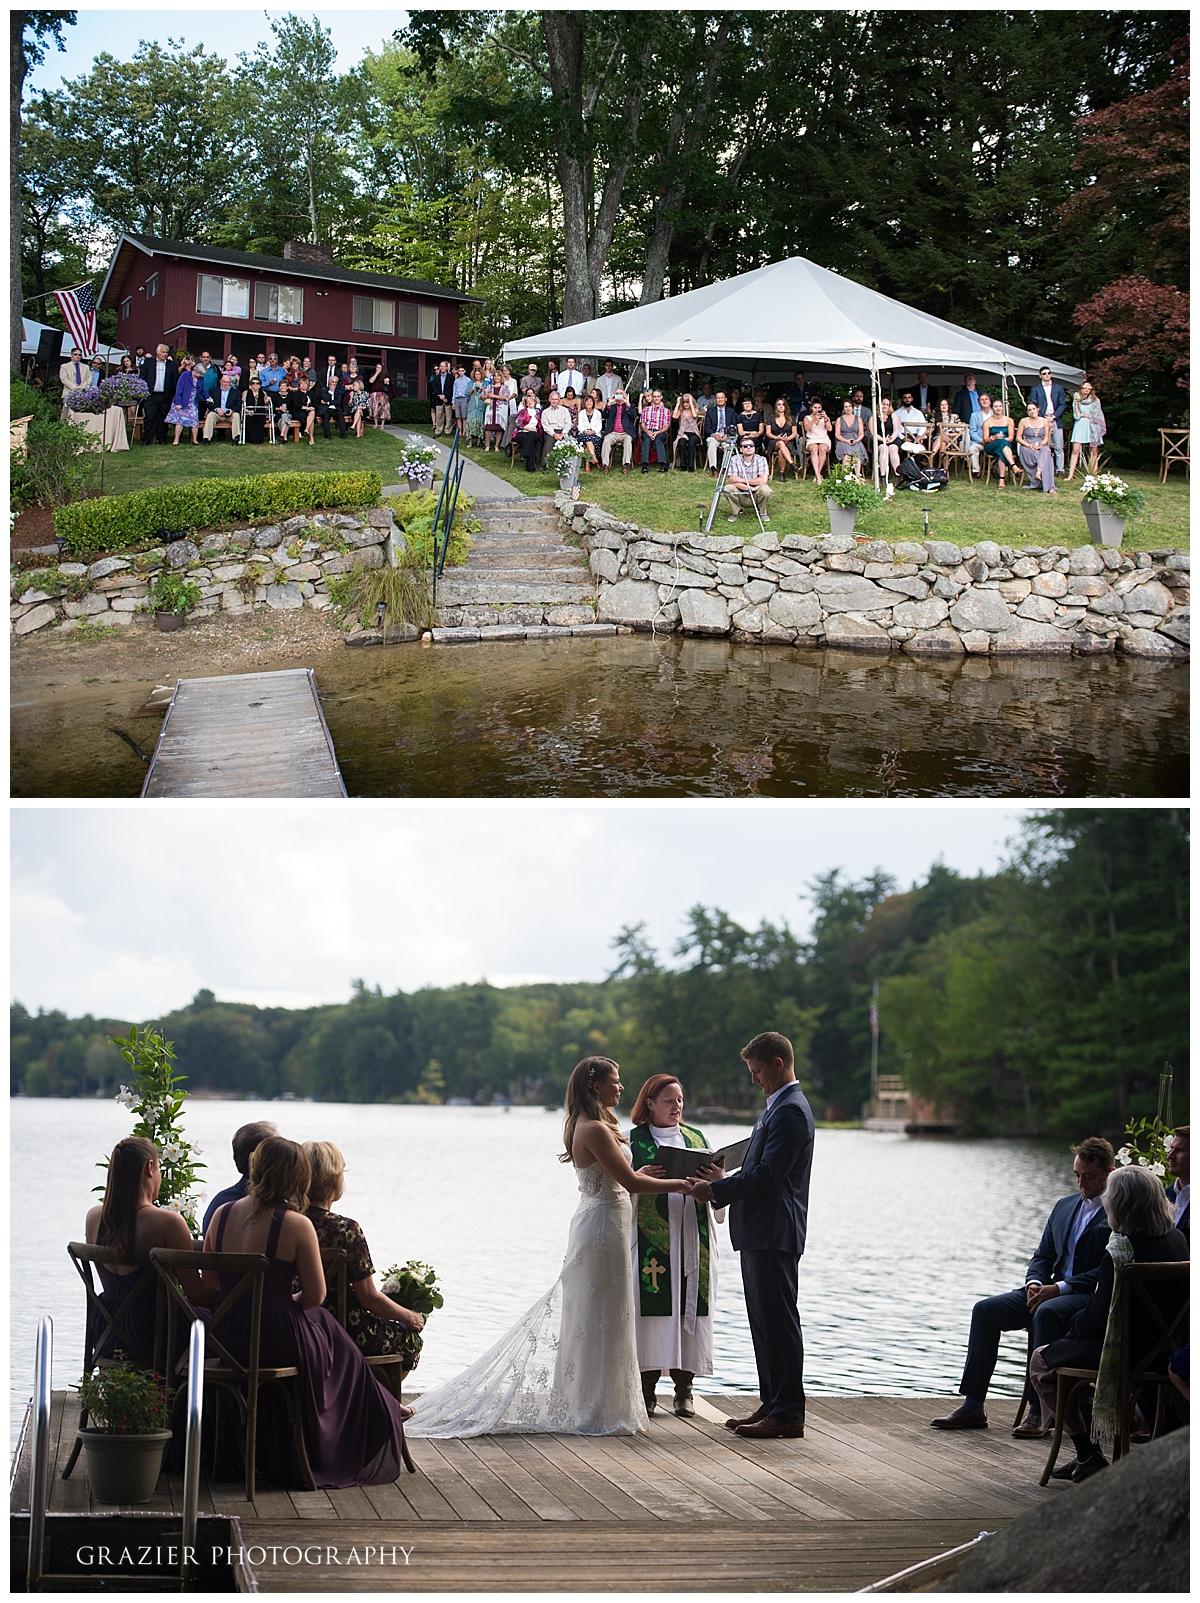 New Hampshire Lake Wedding Grazier Photography 170909-165_WEB.jpg